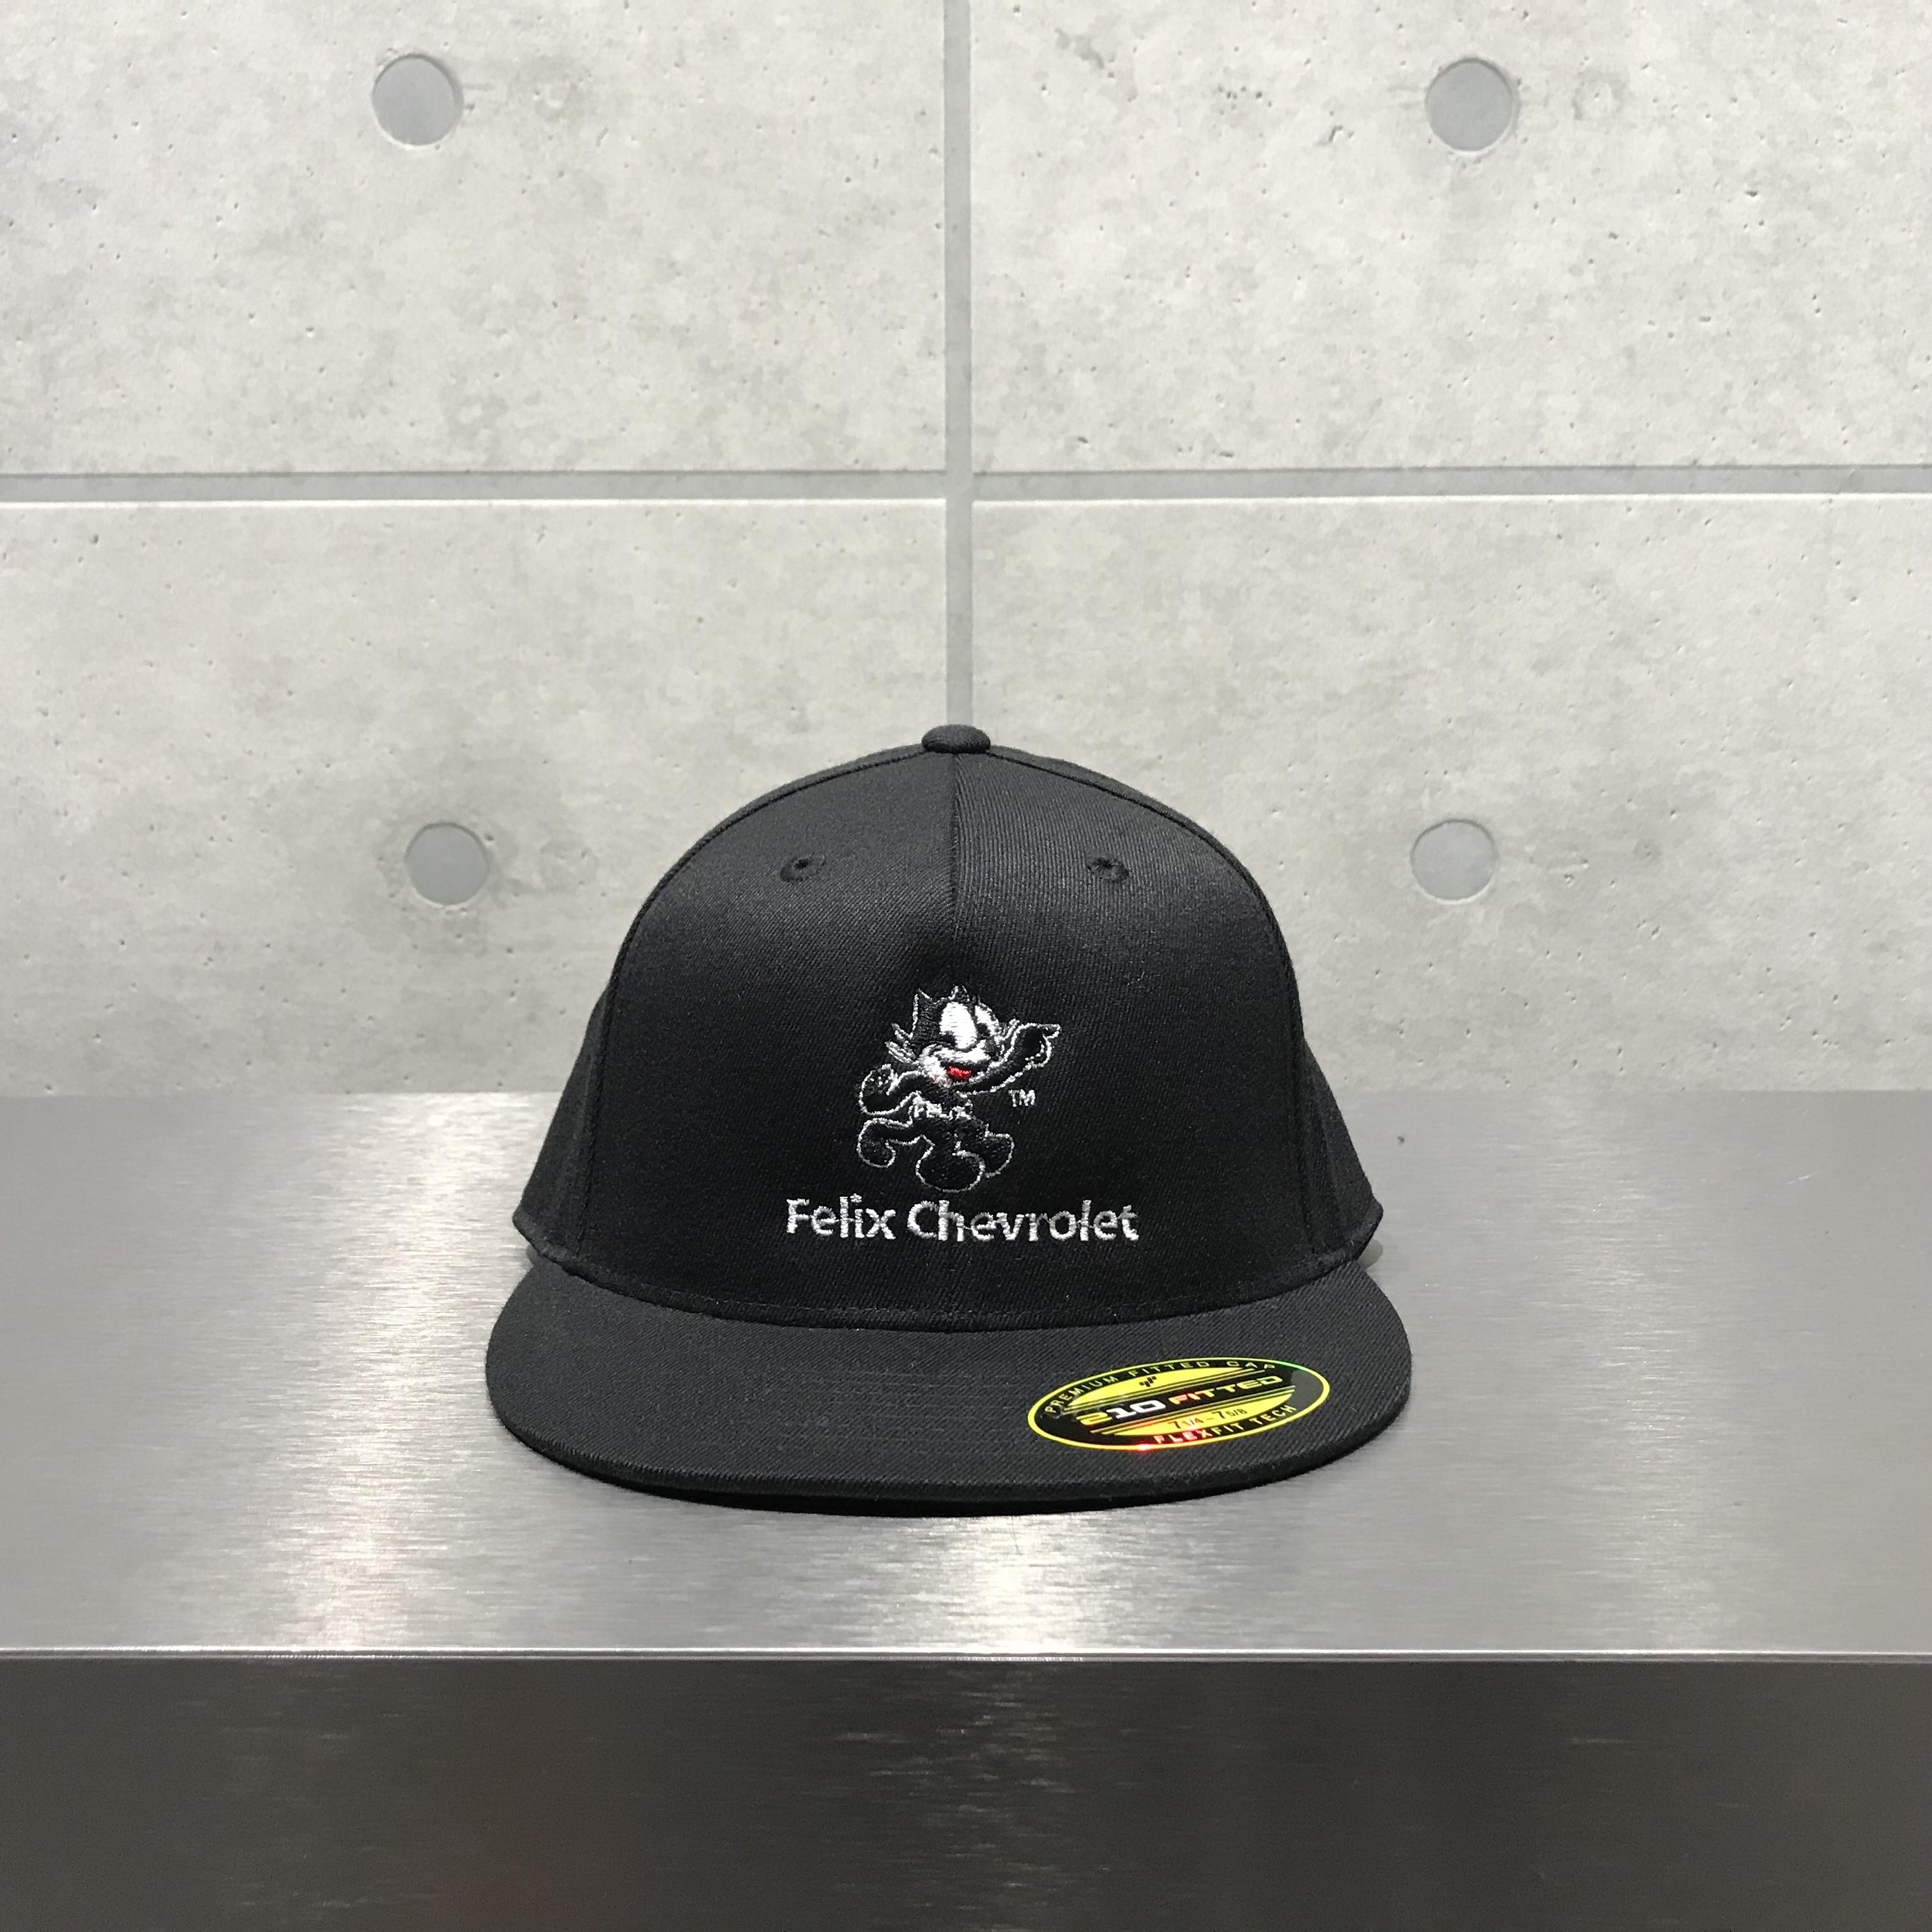 FELIX x CHEVROLET 6-PANEL CAP / BLACK